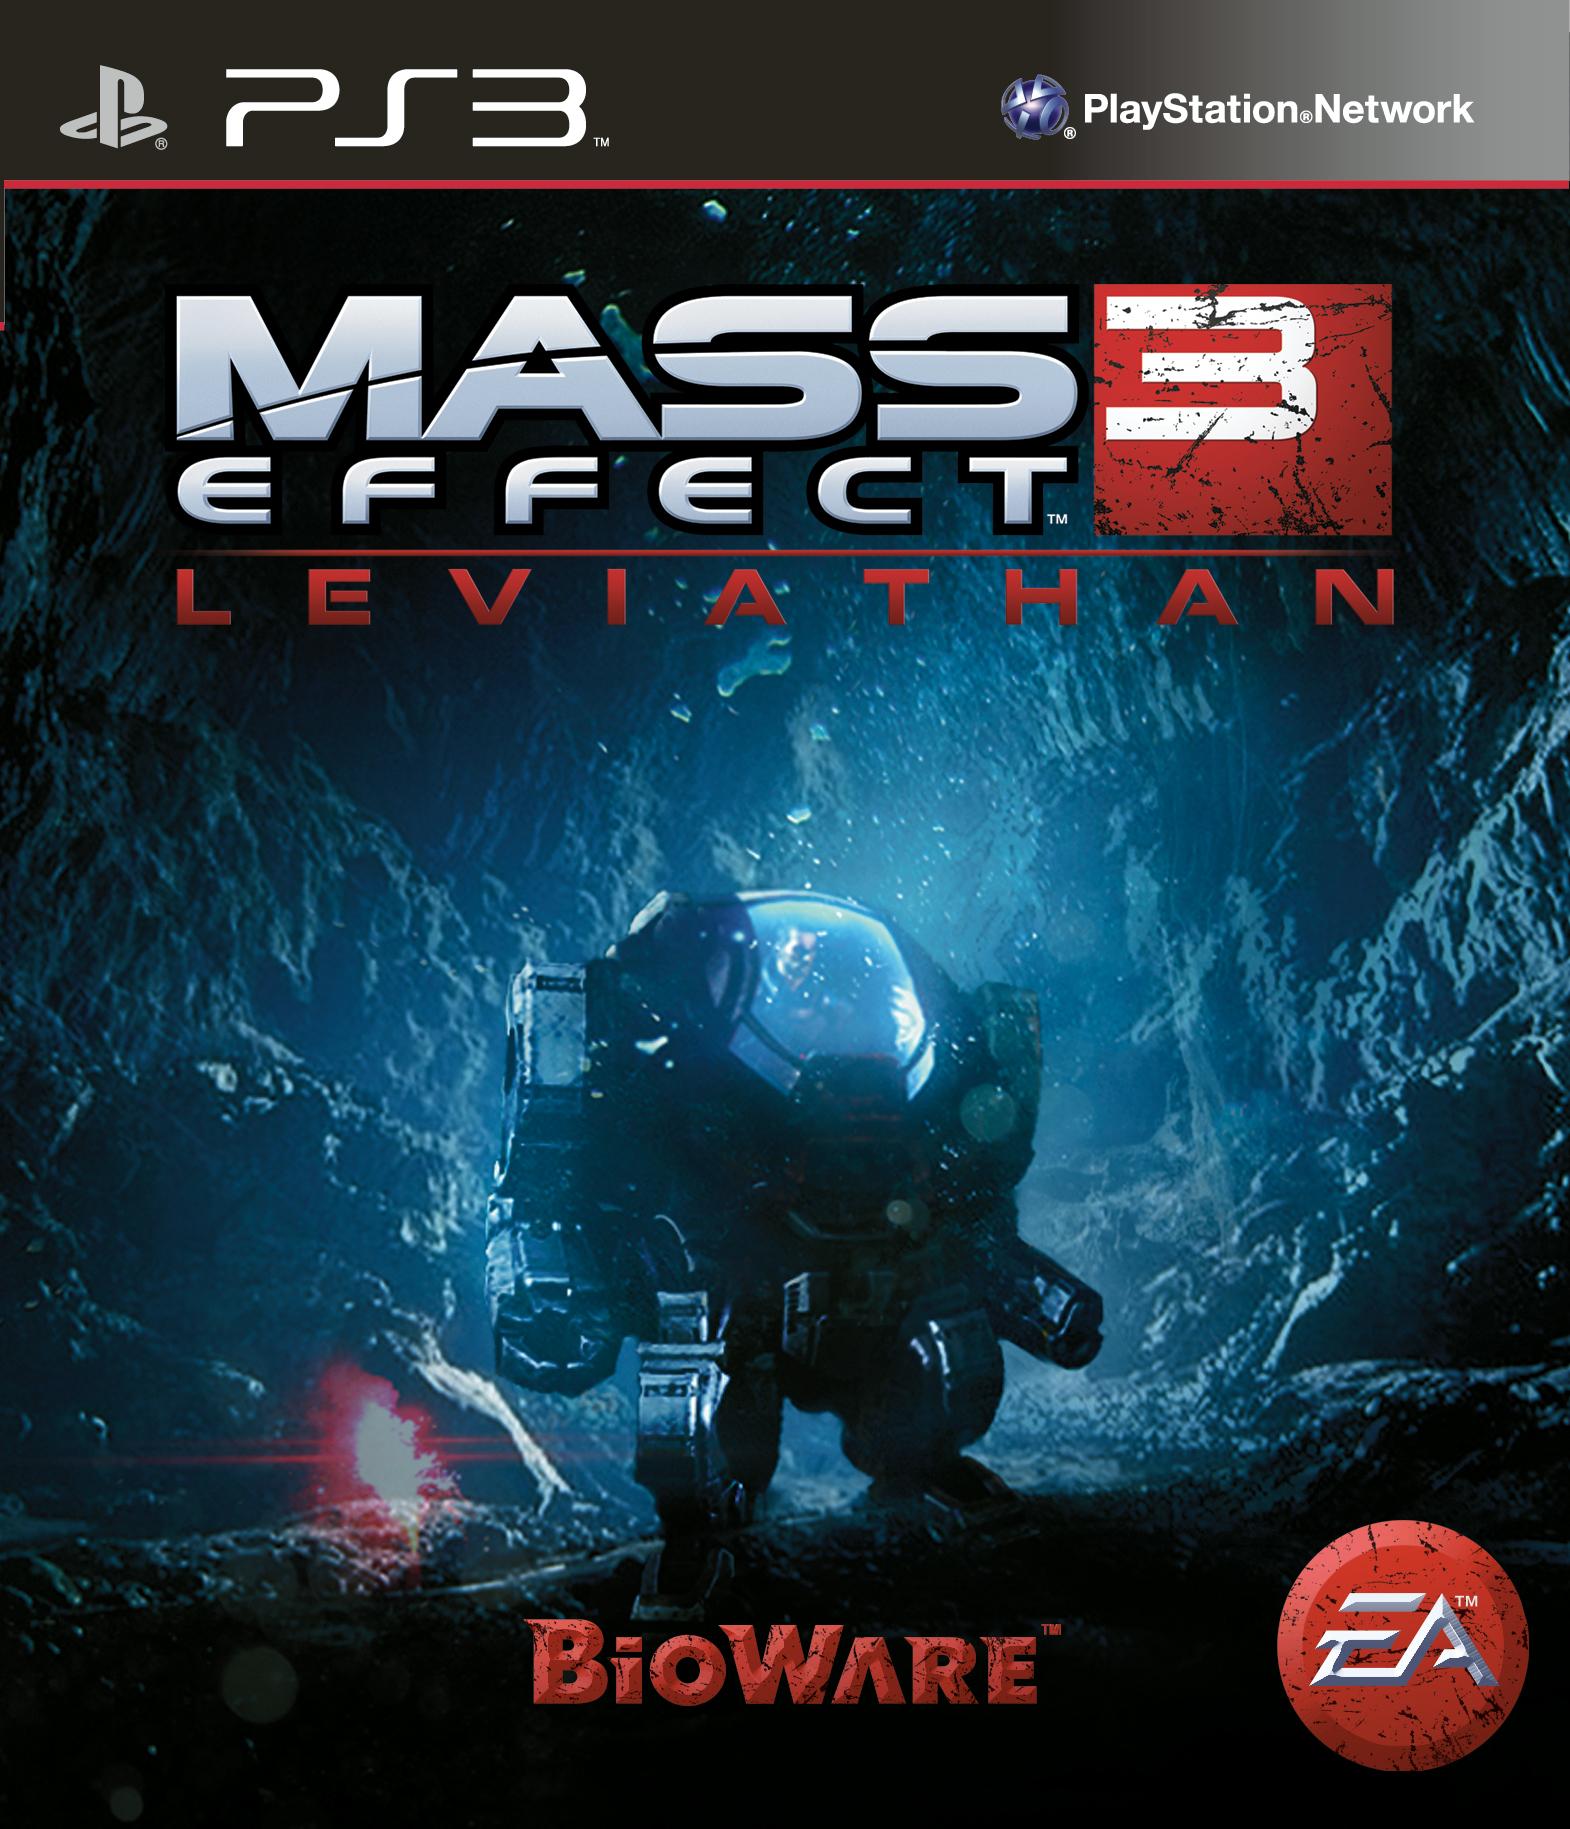 Mass Effect 3: Leviathan PlayStation 3